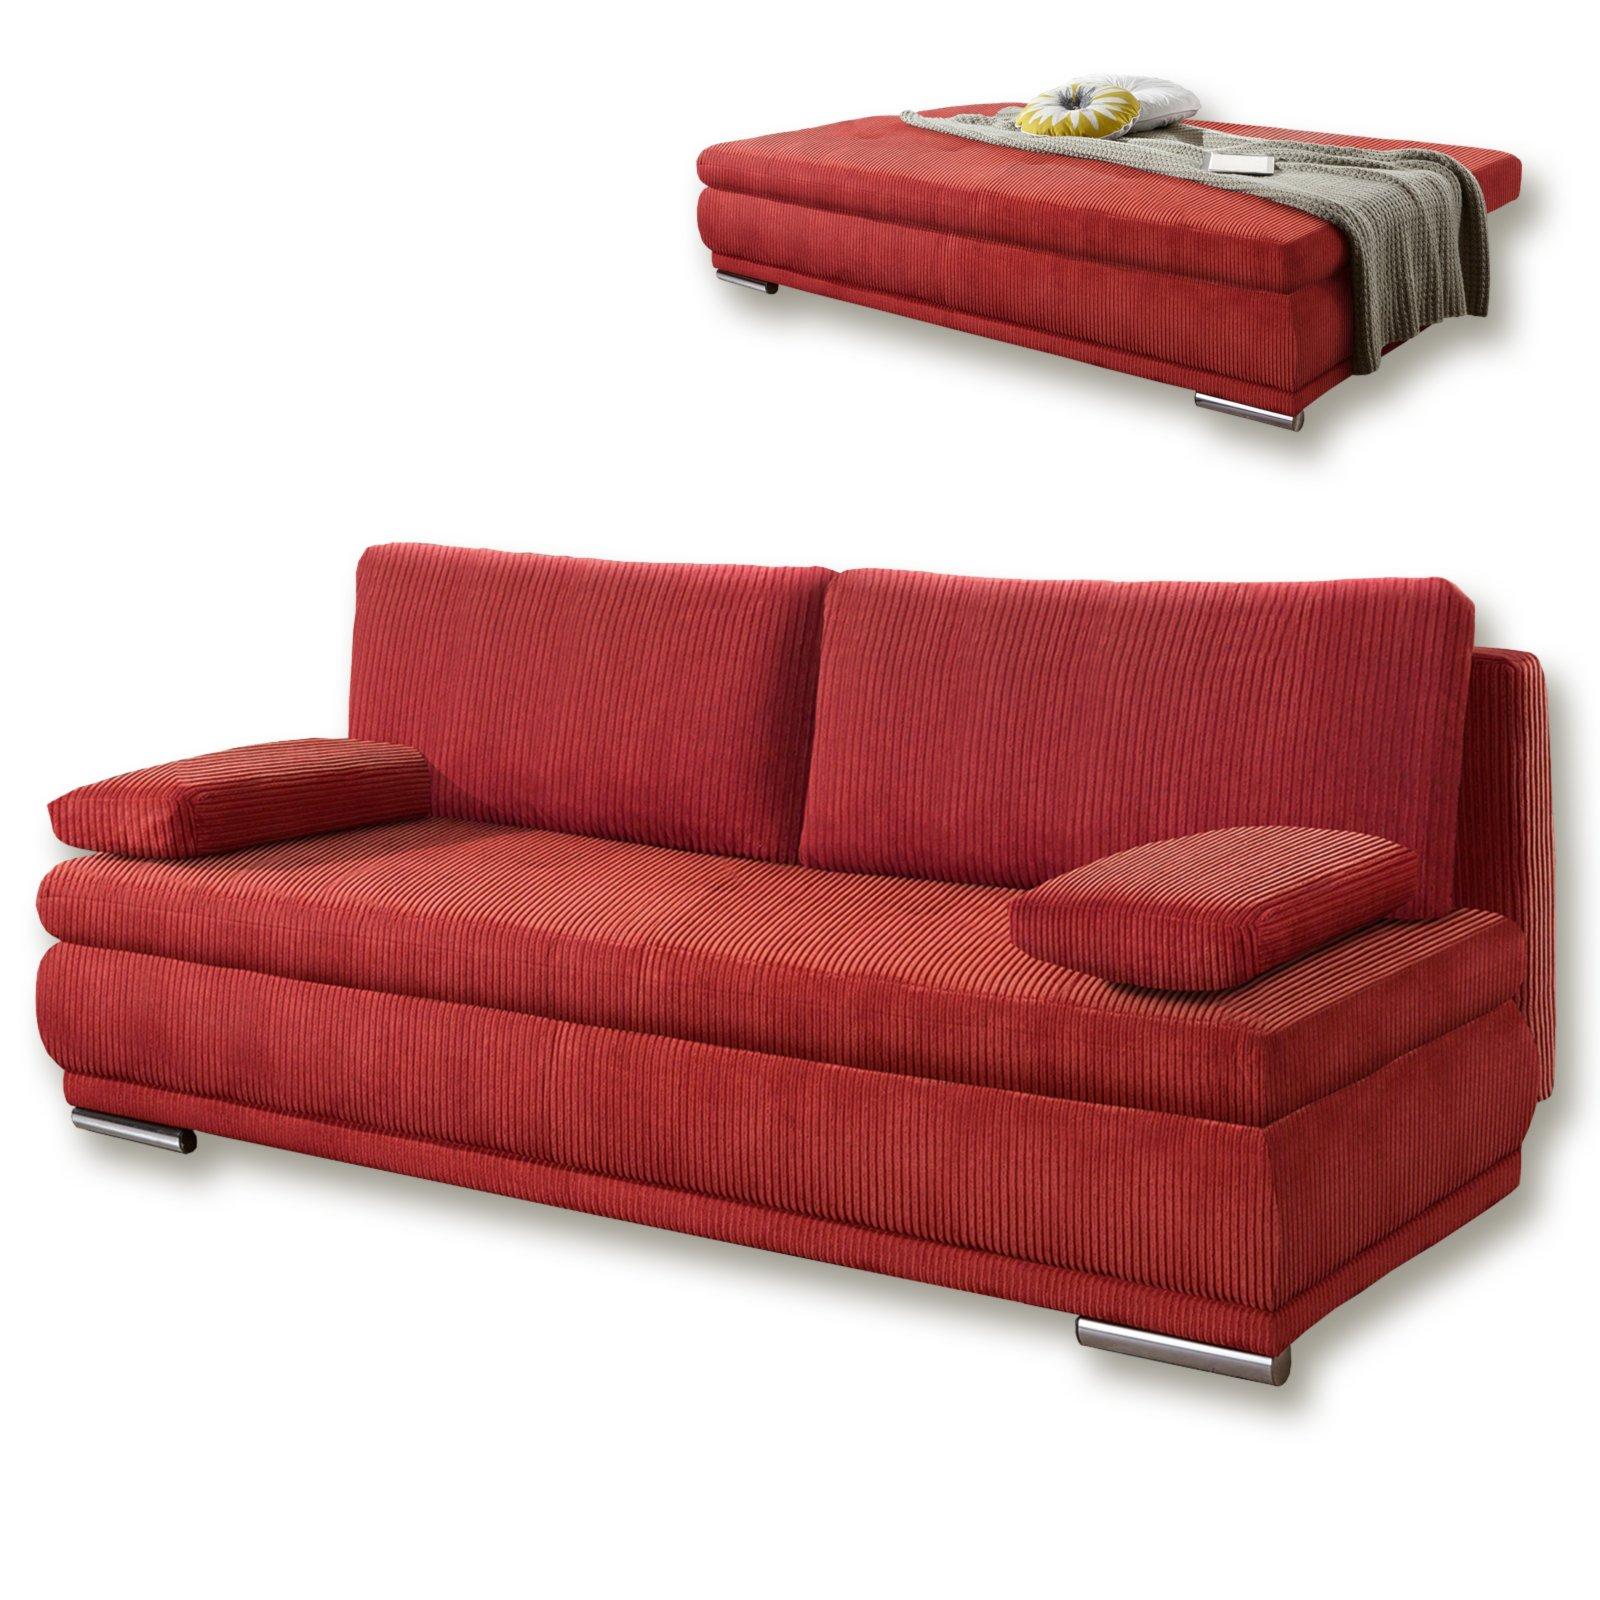 schlafsofa rot federkern 203x144 cm schlafsofas. Black Bedroom Furniture Sets. Home Design Ideas